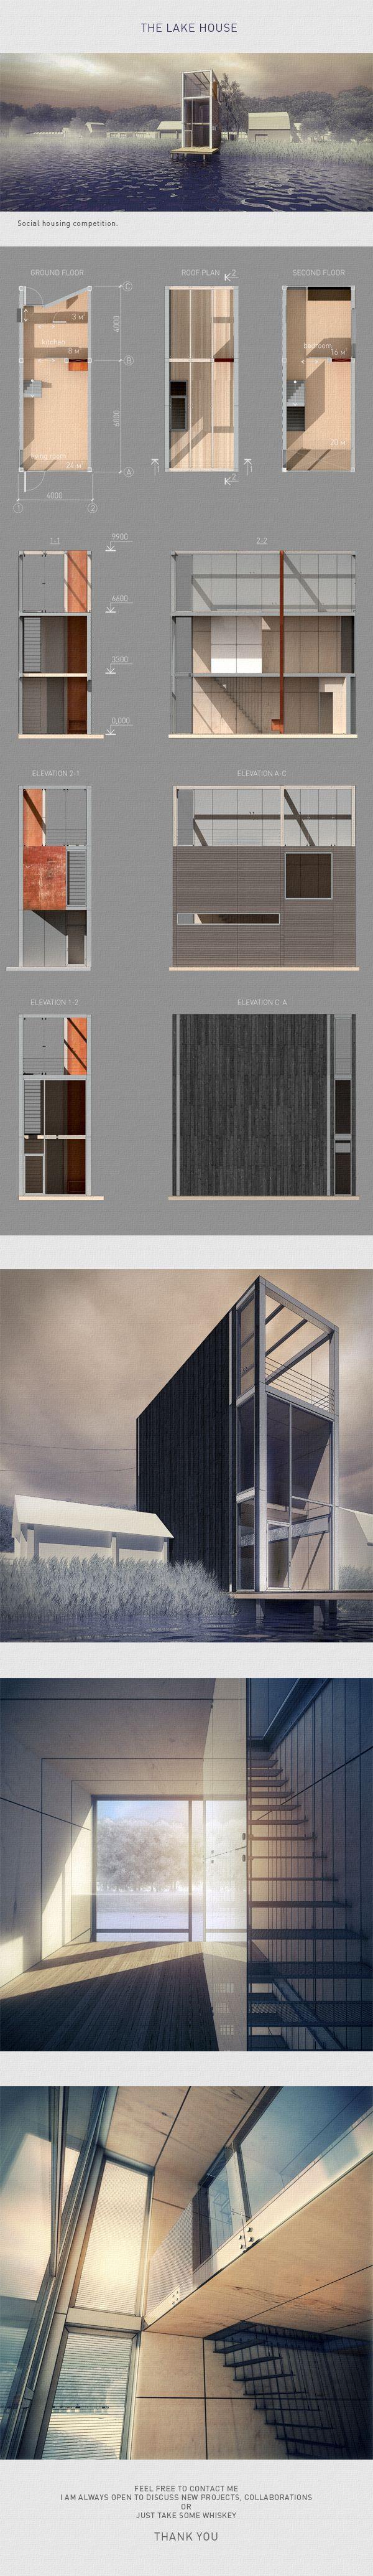 The lake house by Nikita Kolbovskiy, via Behance